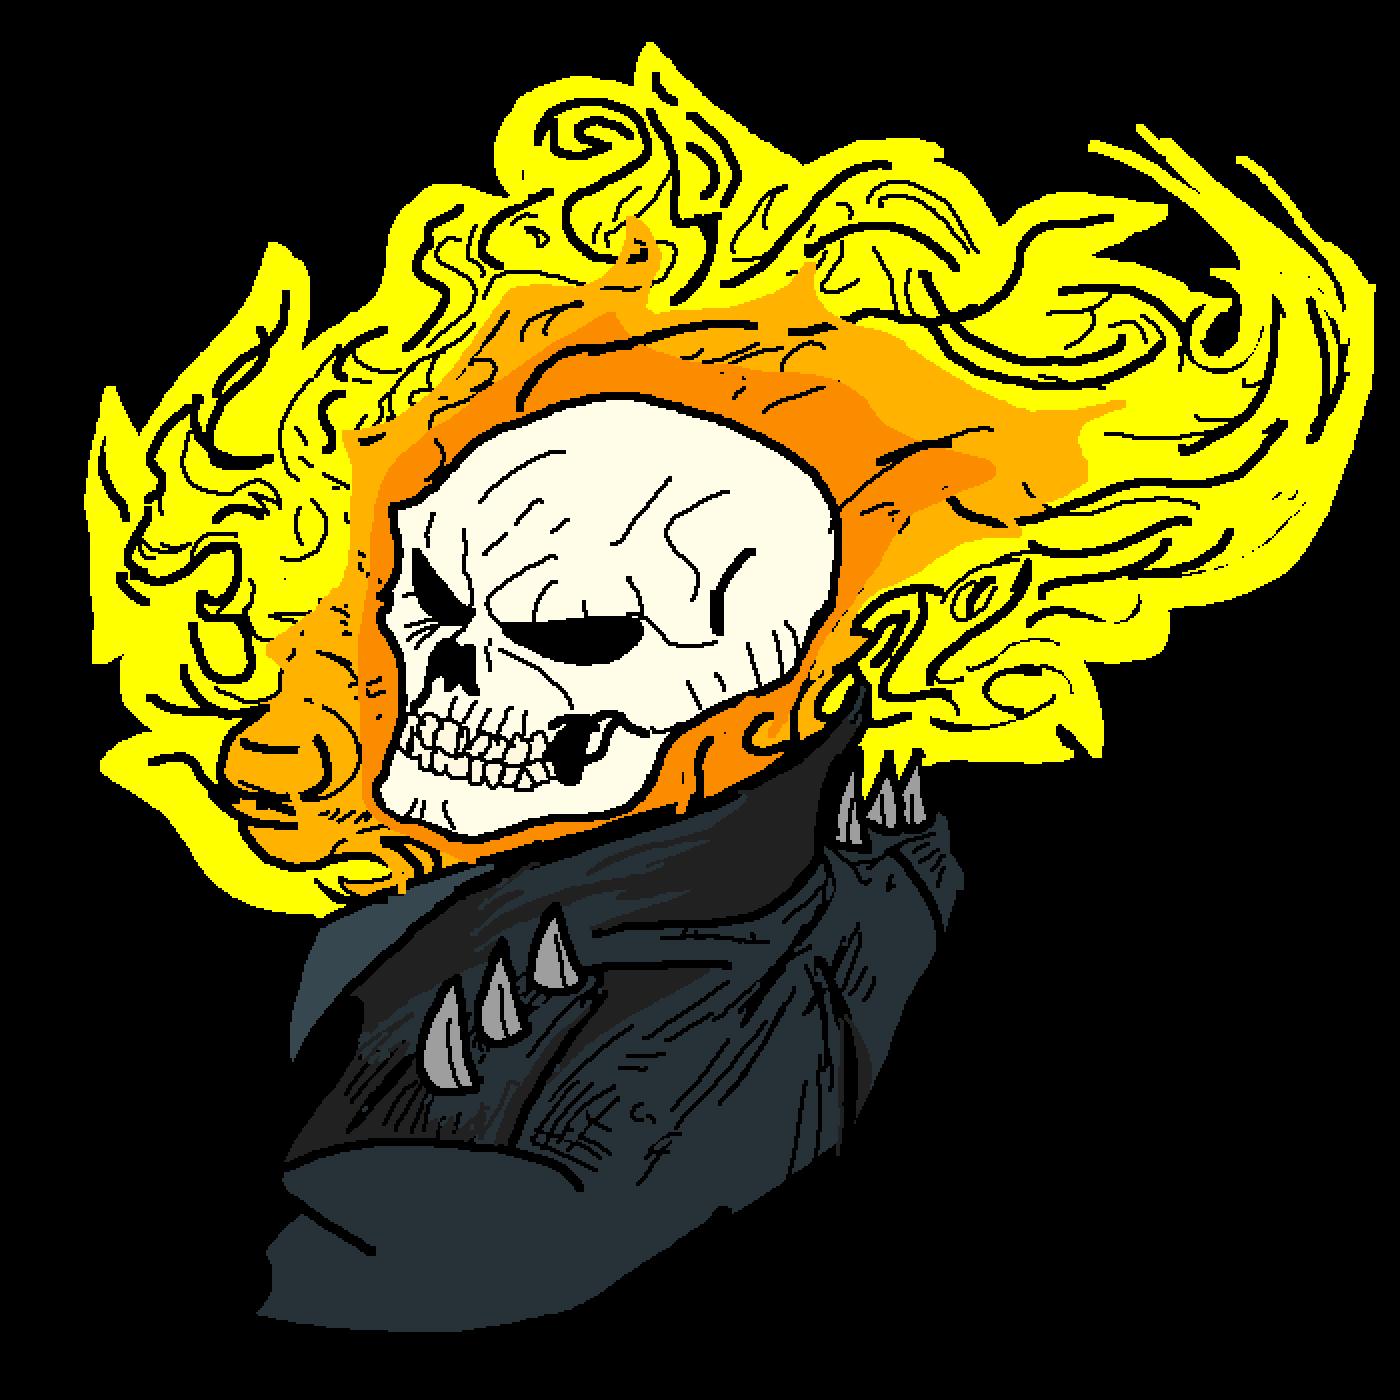 Ghost Rider by Neko-Loli